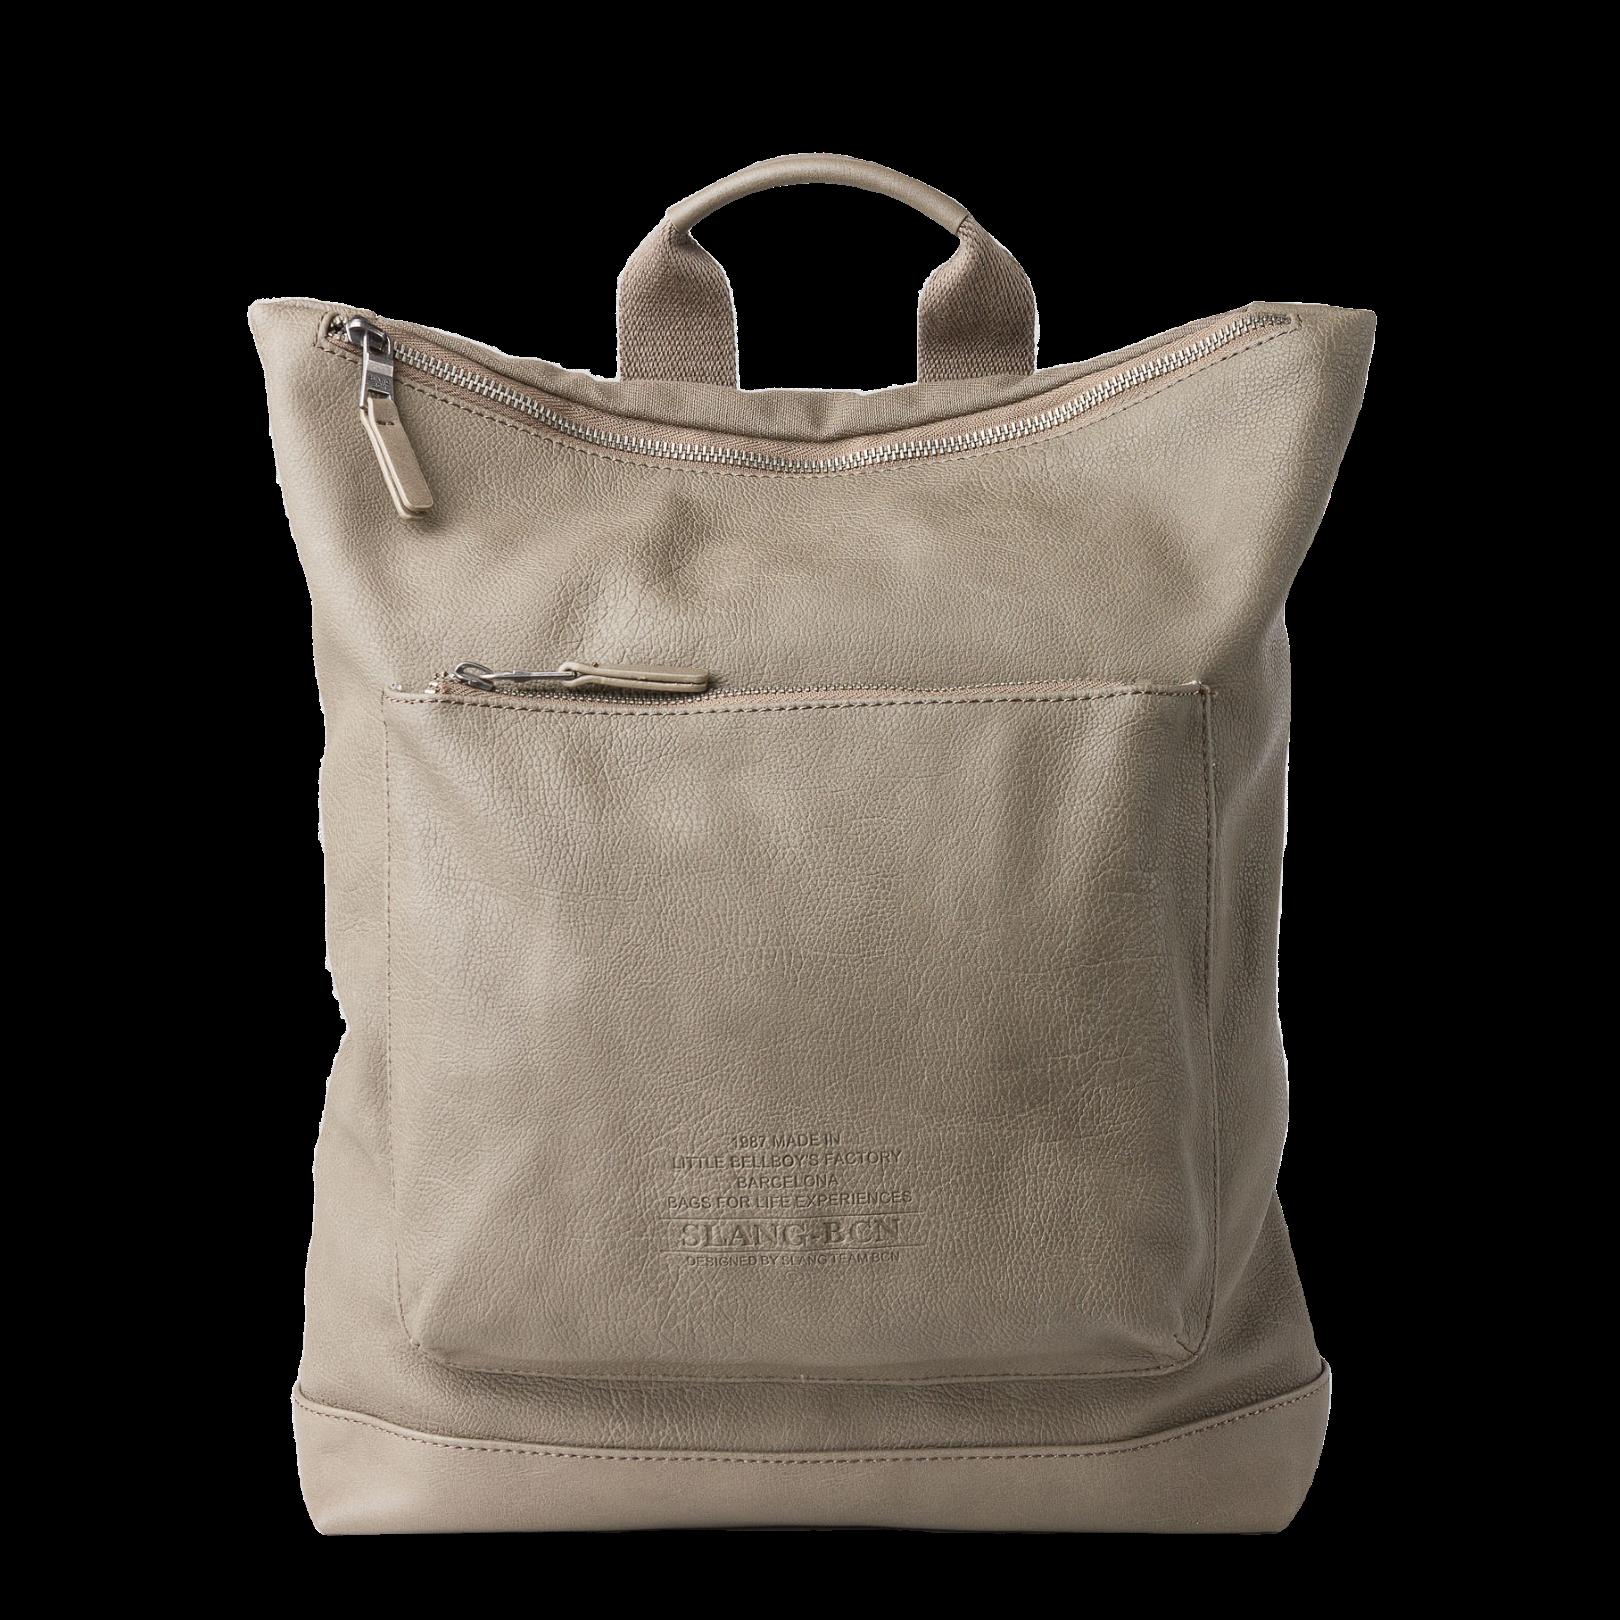 MOCHILA SLANG SIROCO MEN 69%E2%82%AC(1) - Una mochila para cada tipo de hombre